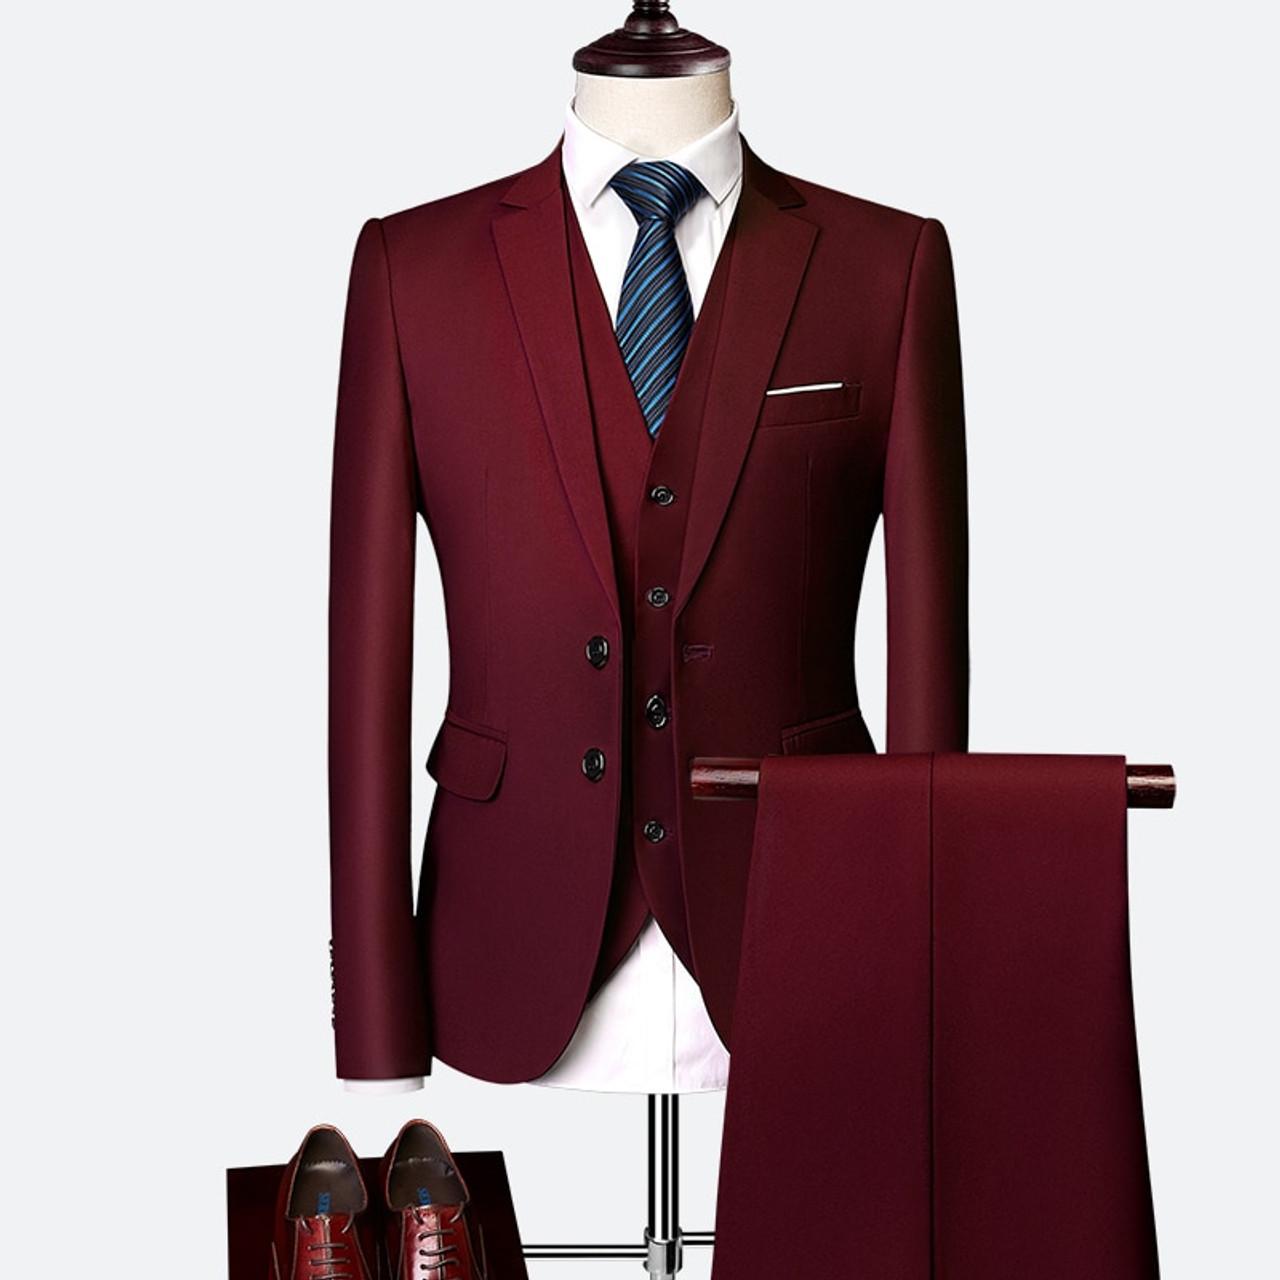 8f3c1198c0 Plyesxale 3 Piece Wedding Suits For Men Slim Fit Men's Suits Formal  Burgundy Green Purple Yellow Red White Man Suit 5XL 6XL Q63